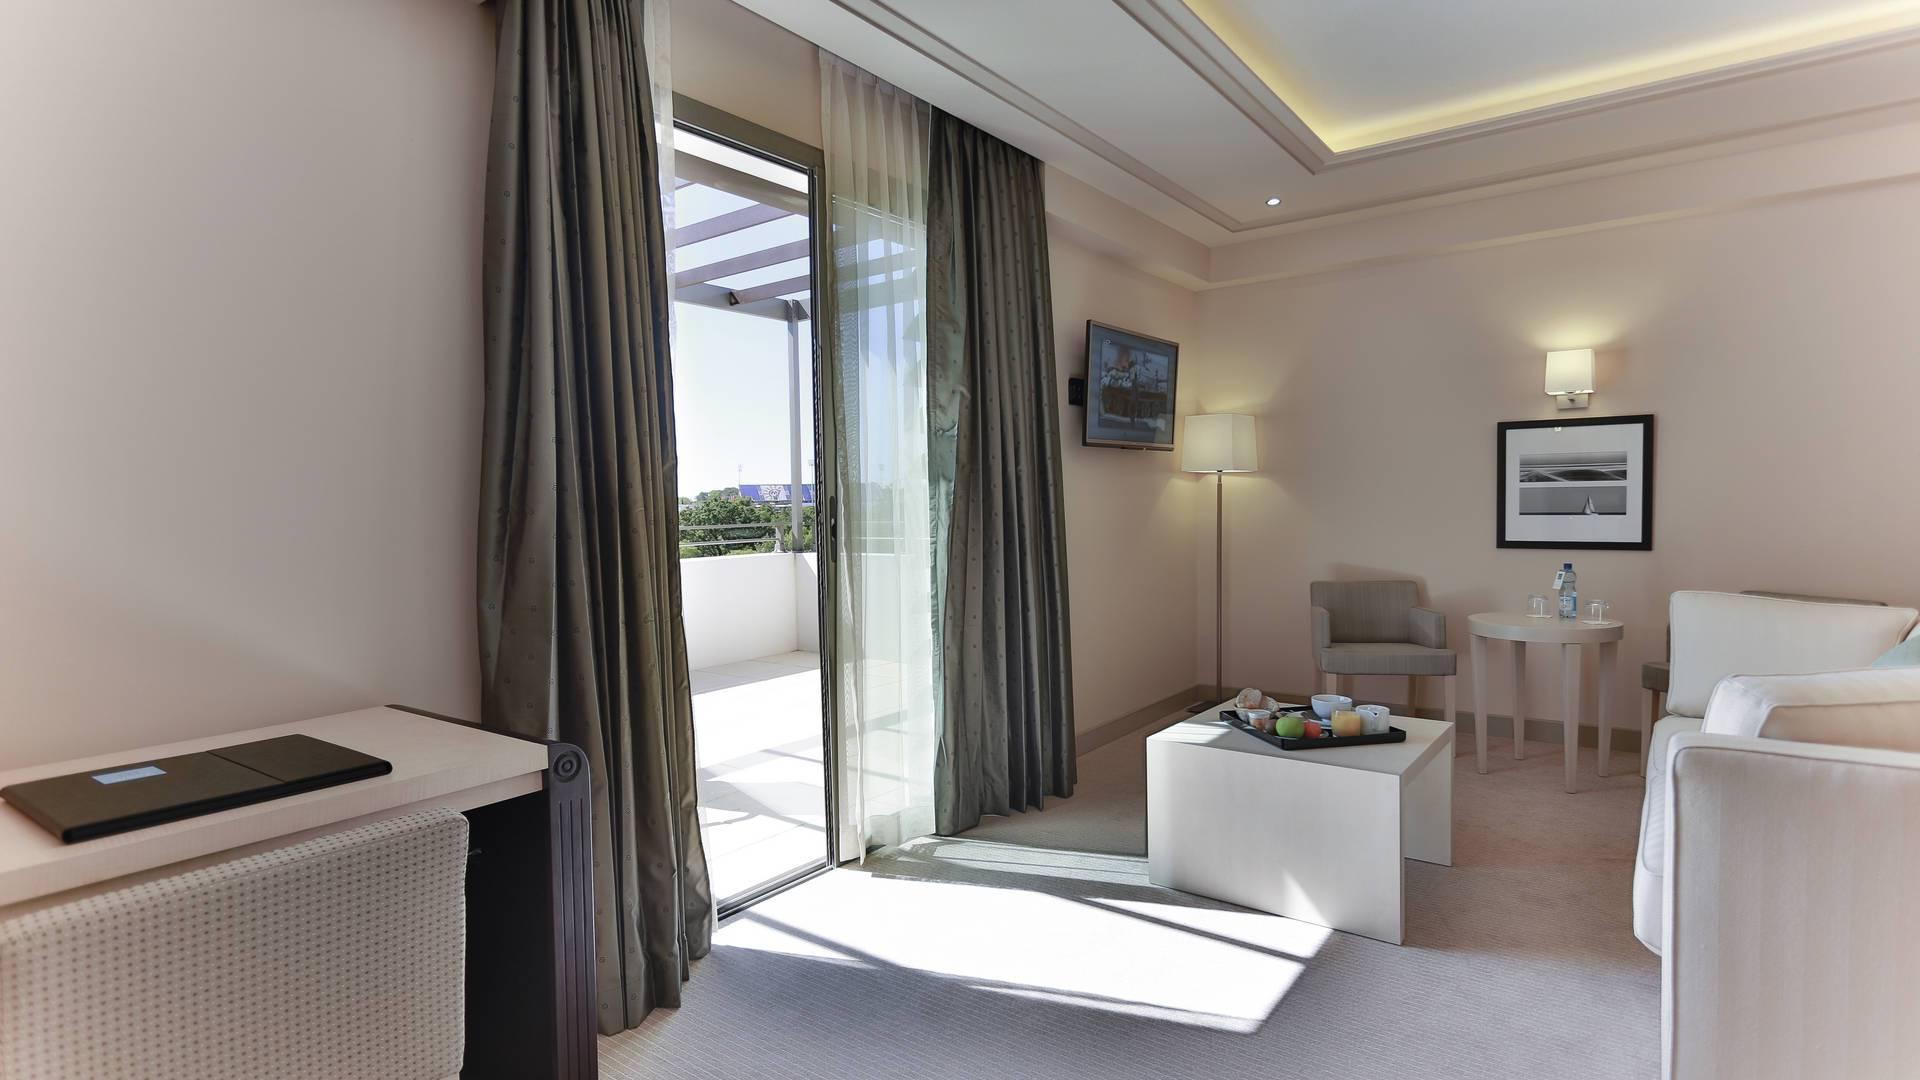 hotel-spa-de-fontcaude-juvignac-montpellier-occitanie-chambre